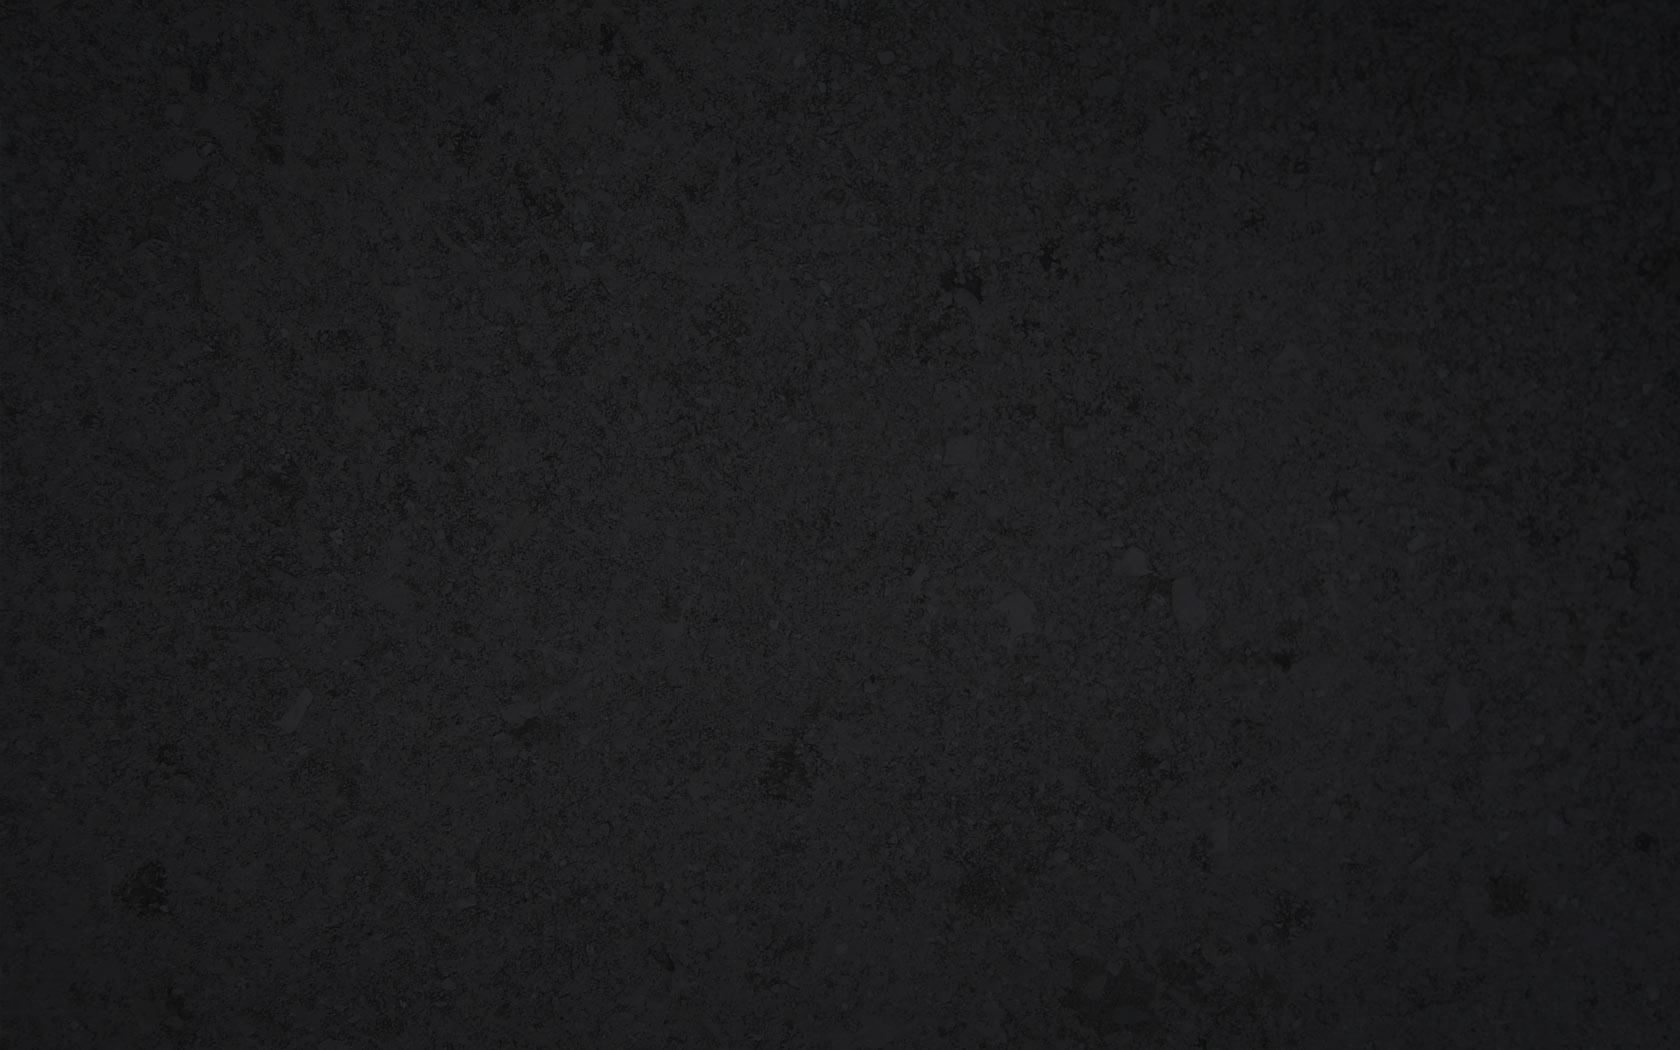 Texturas y wallpapers para tus dise os en hd taringa - Papel pared negro ...